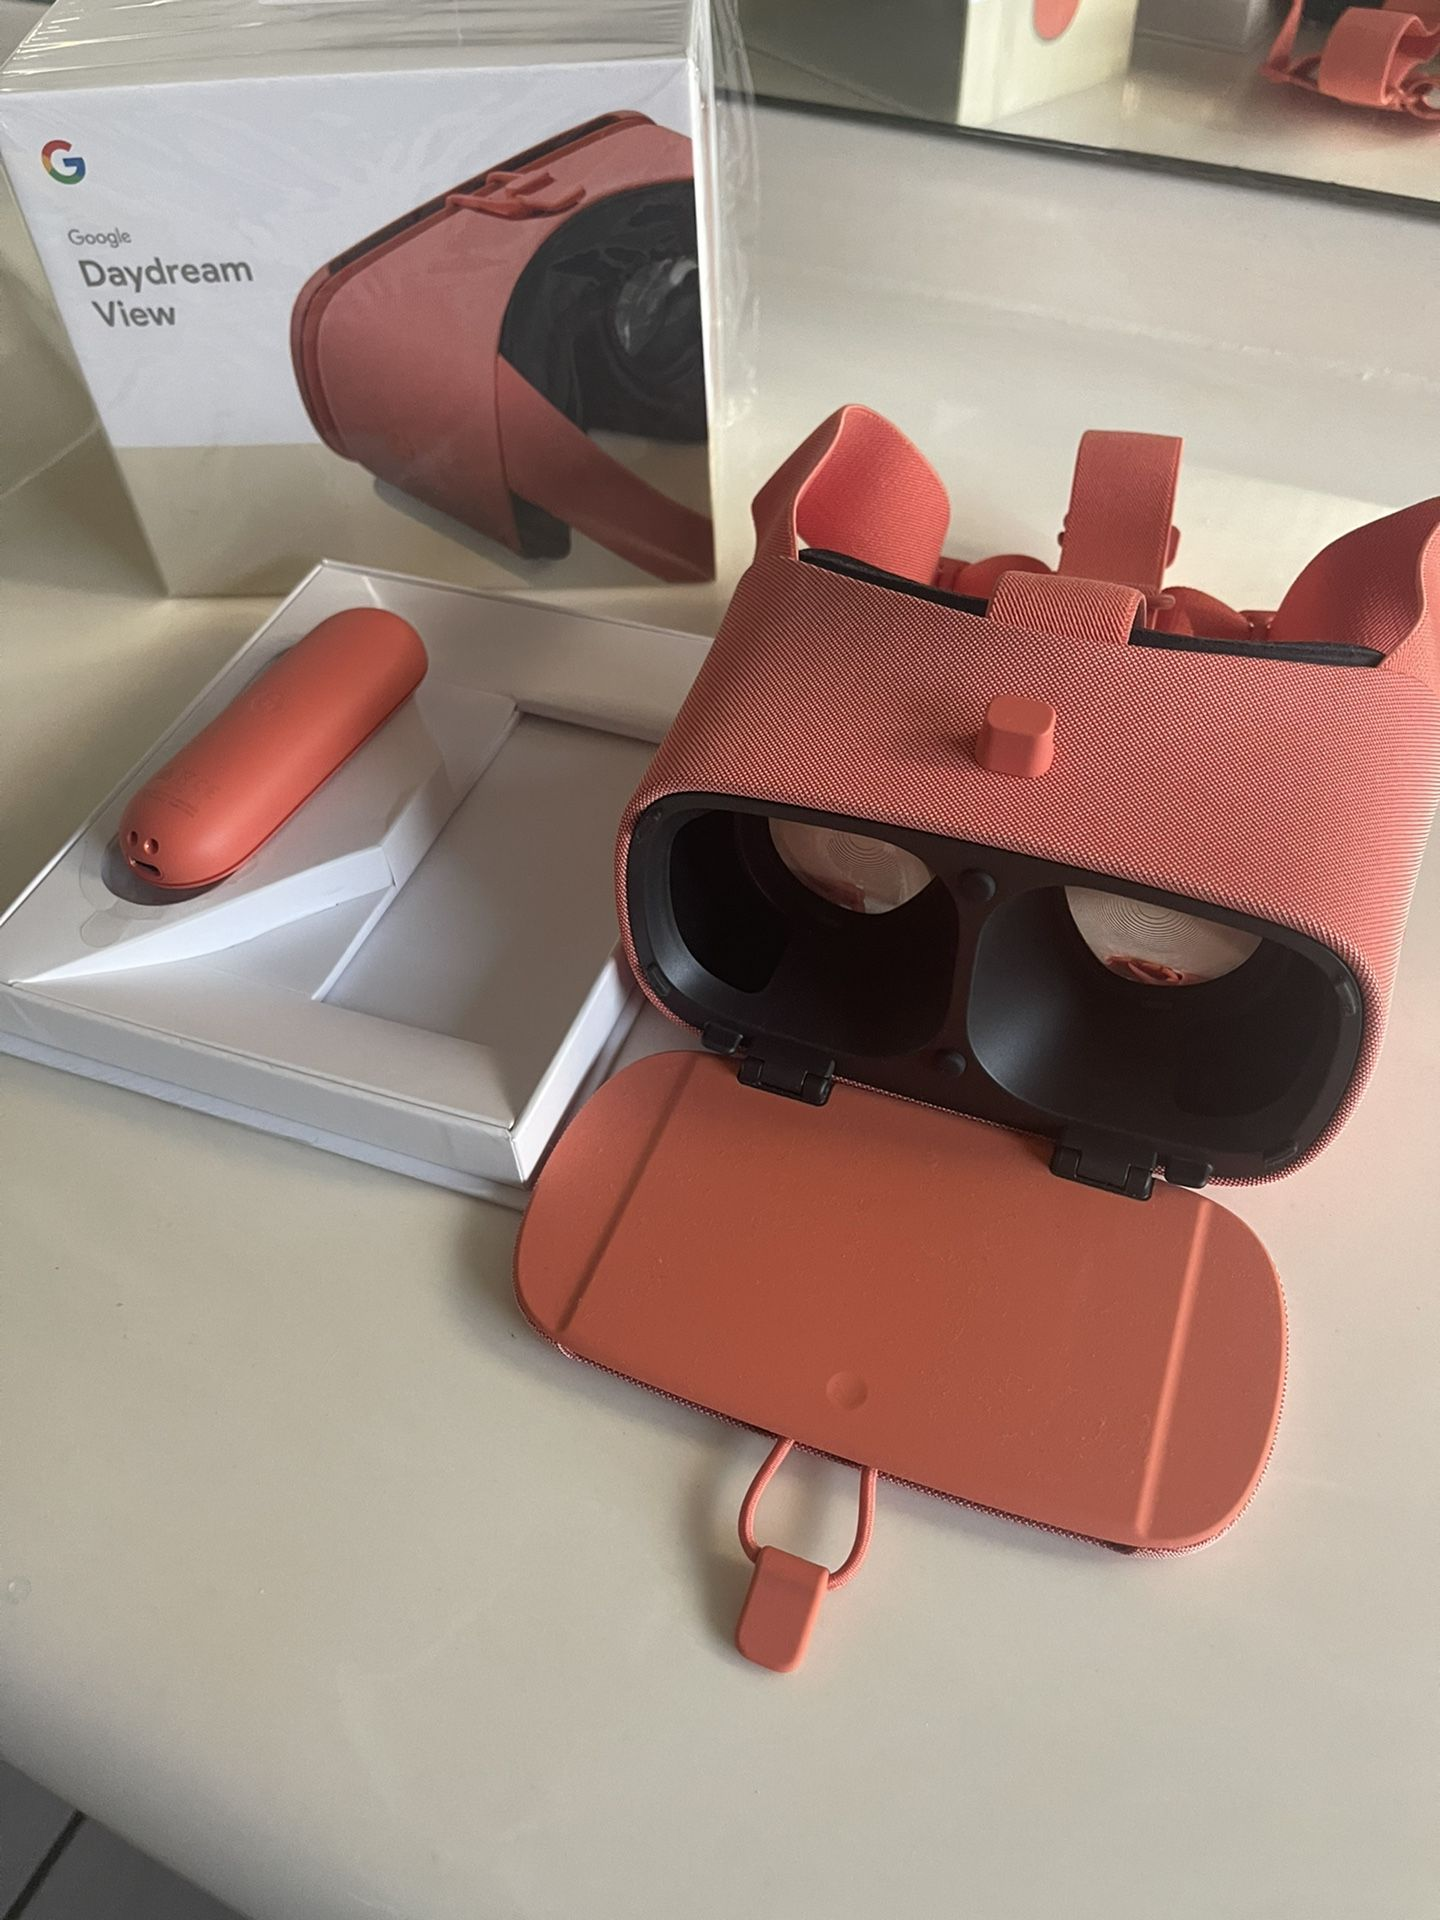 Google Daydream VR, Coral Color